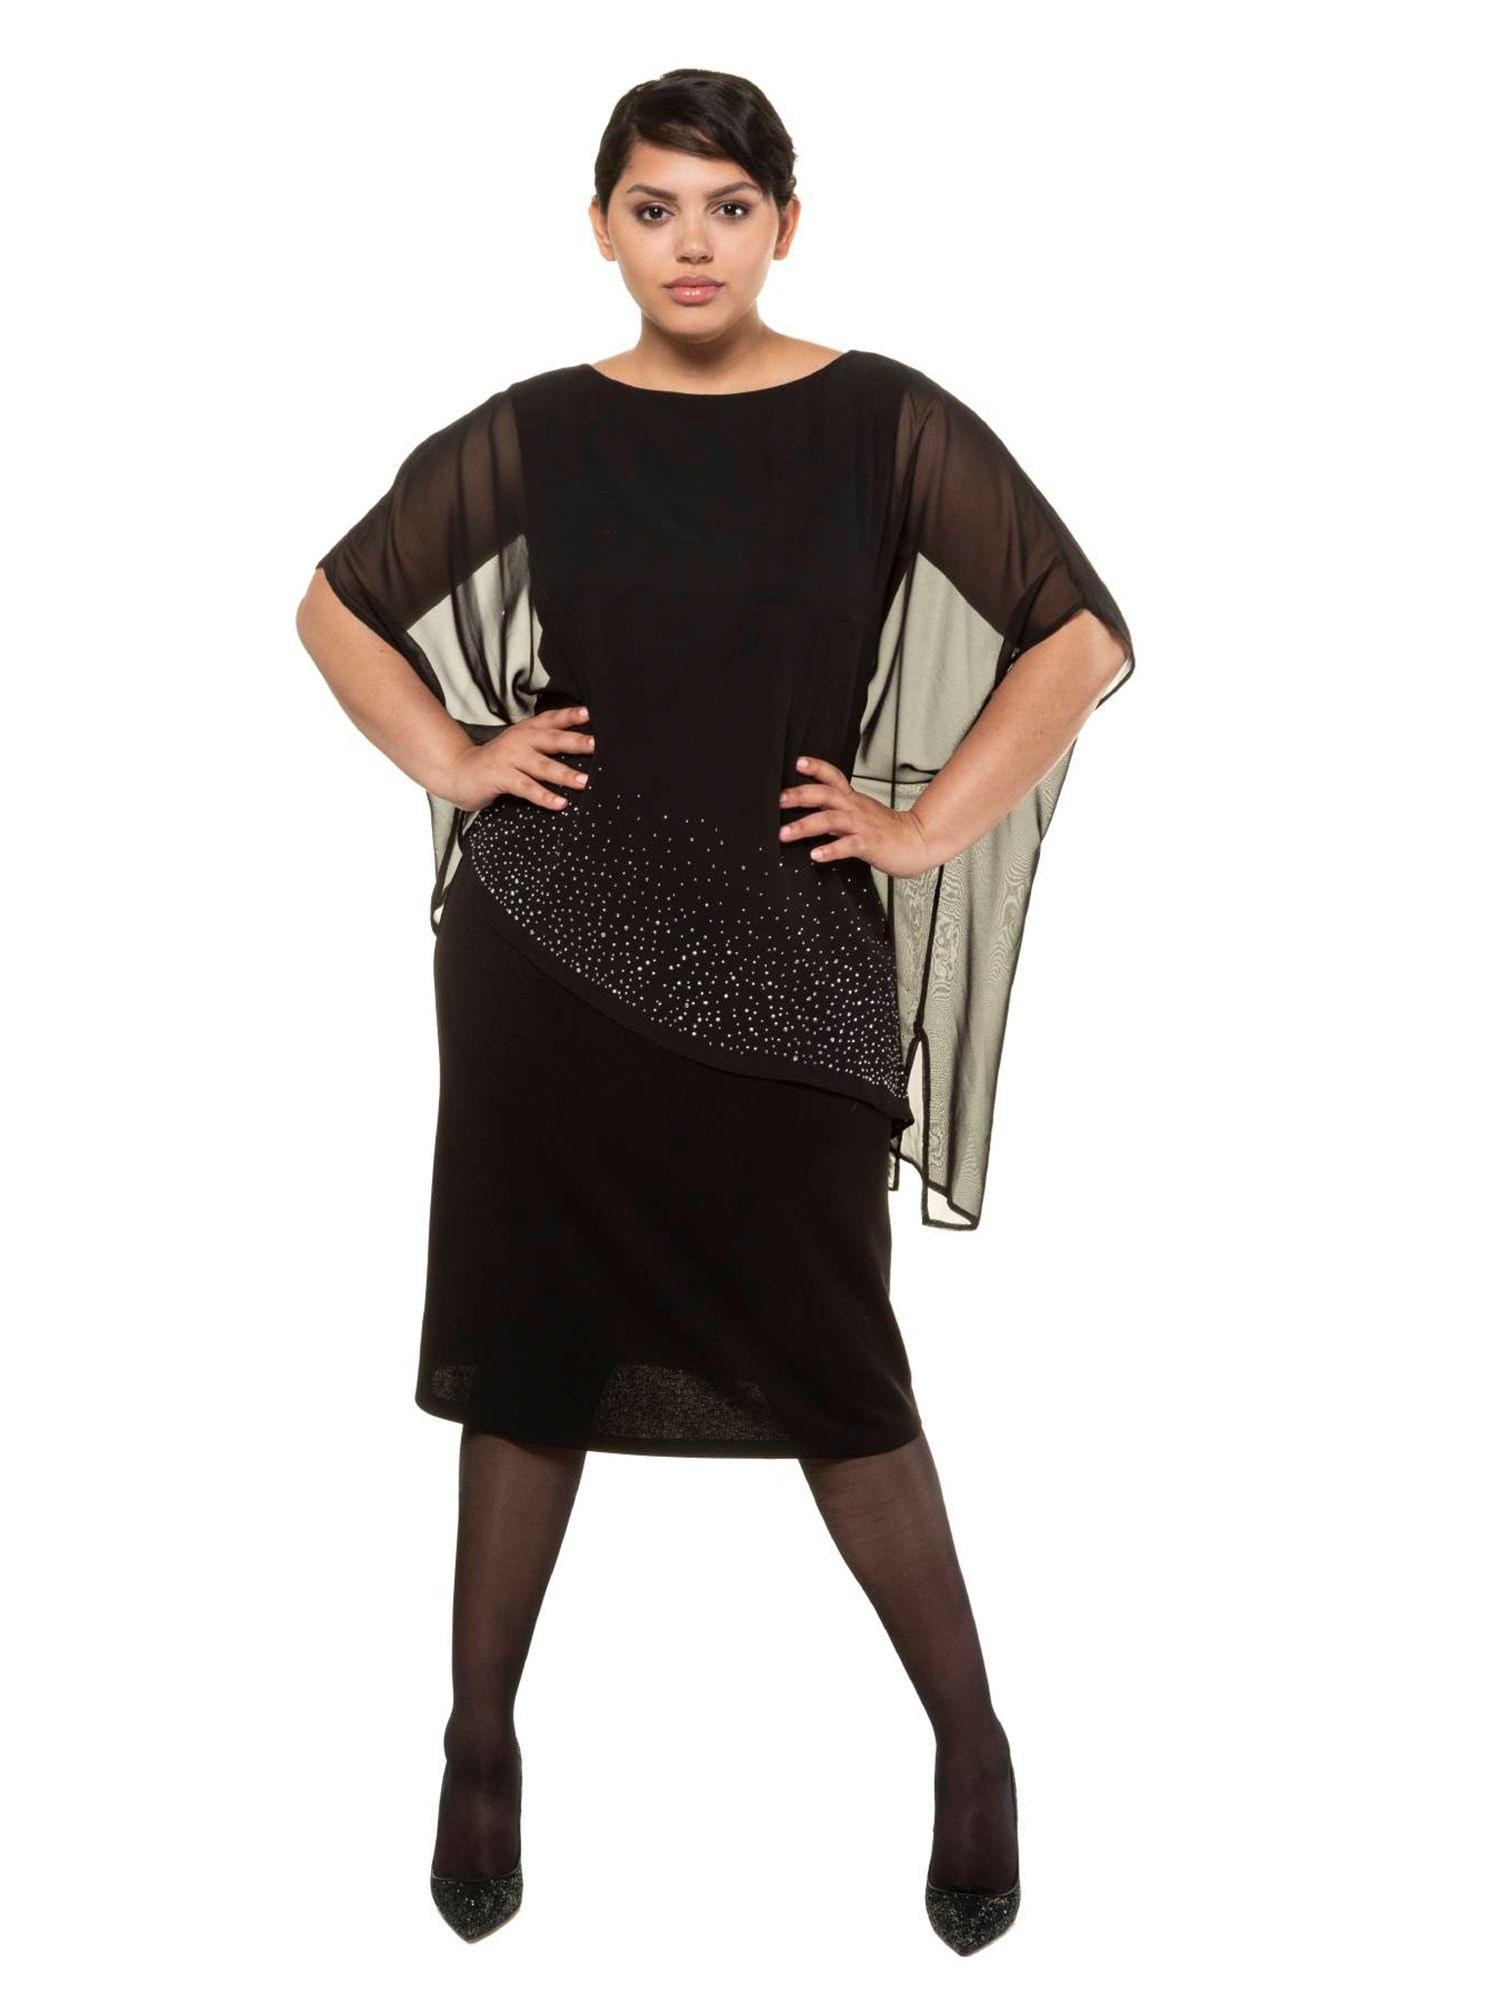 Designer Fantastisch Abendkleid Ulla Popken SpezialgebietAbend Coolste Abendkleid Ulla Popken Ärmel